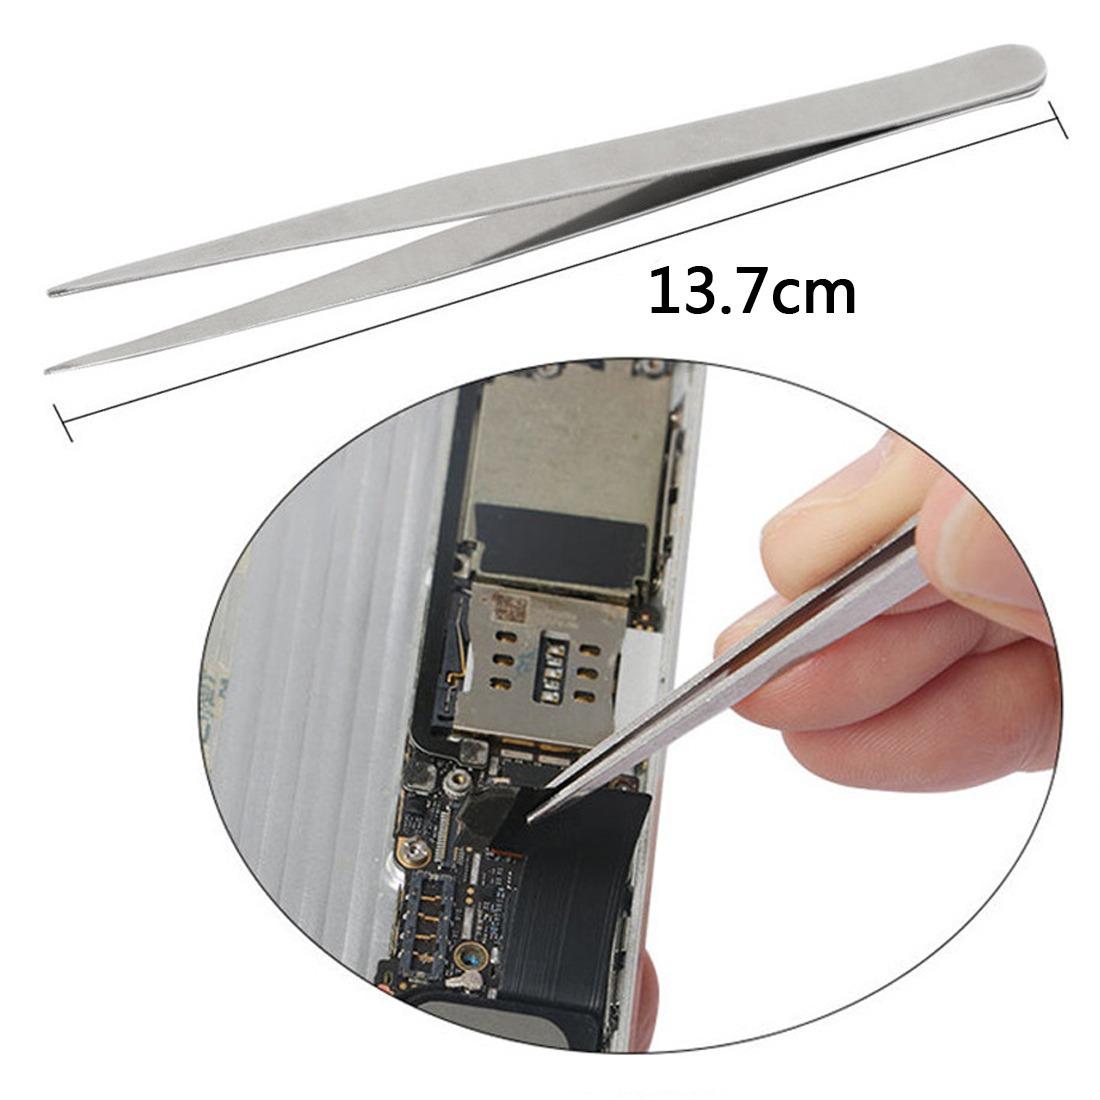 2afa9607214 kit de herramienta para reparacion celulares tablets iphone. Cargando zoom.